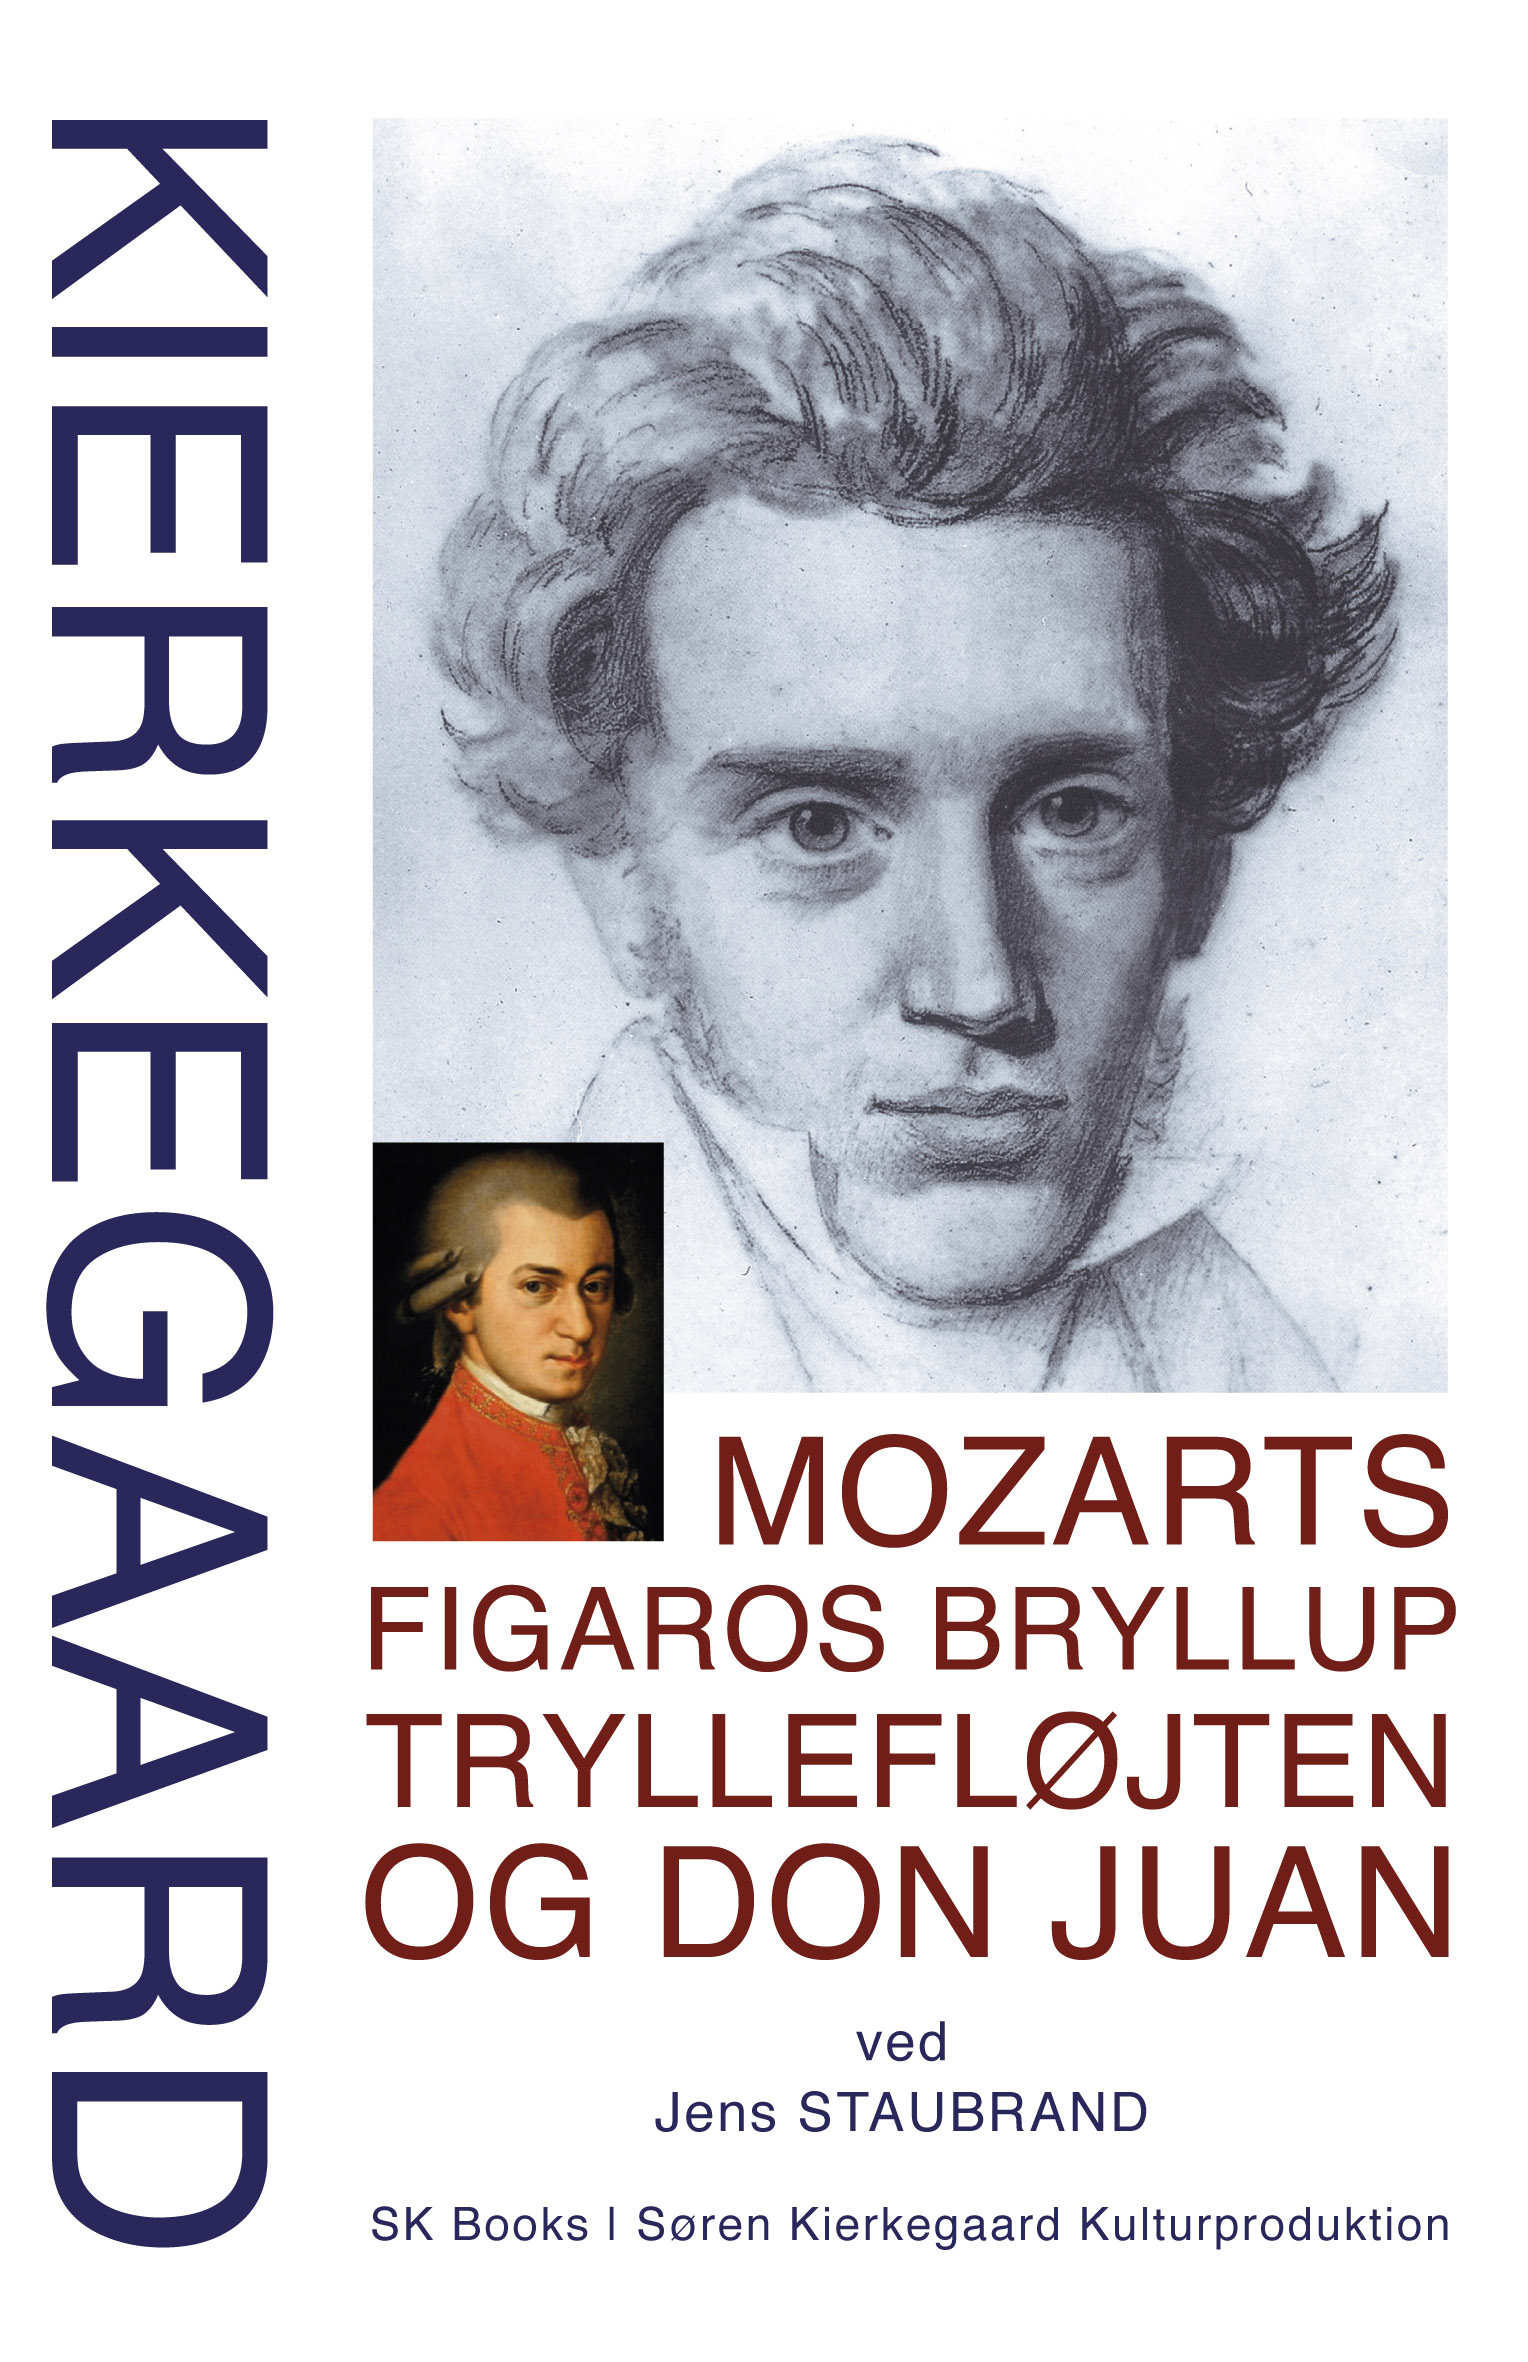 KIERKEGAARD Mozarts Figaros Bryllup, Tryllefløjten og Don Juan, ved Jens Staubrand